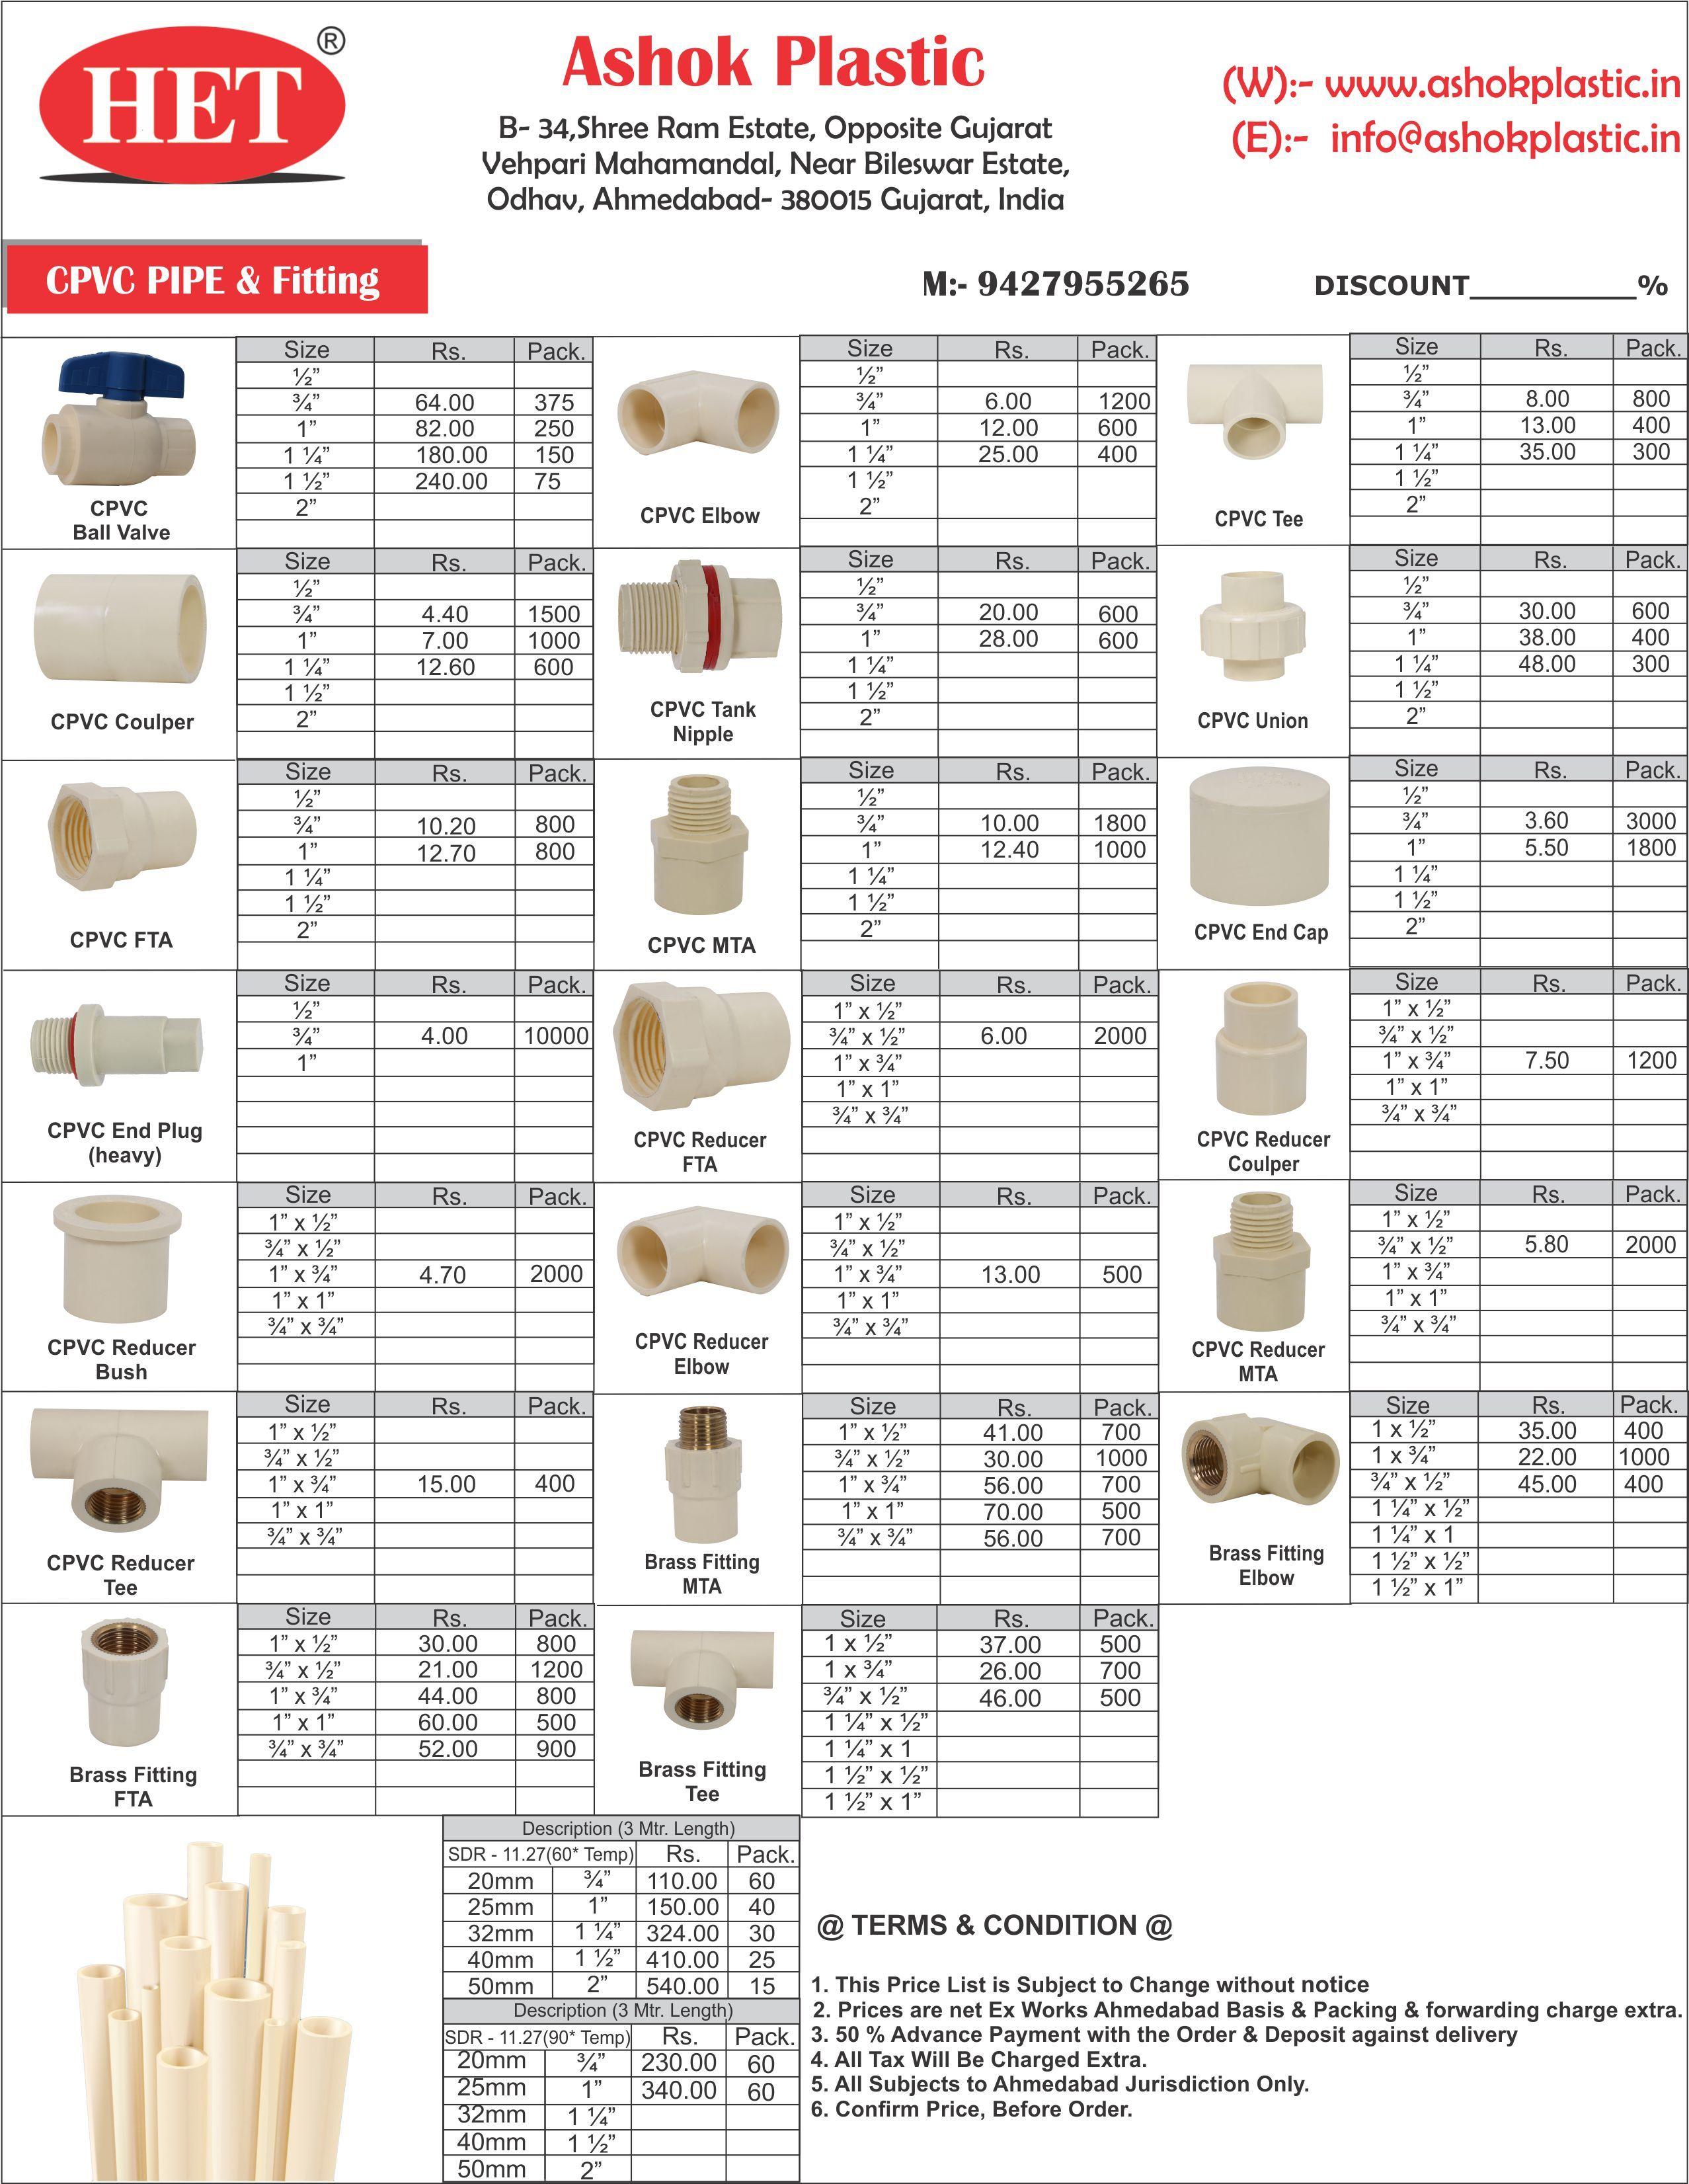 Free handyman price list - Cpvc Pipe Fitting Price List Ashok Plastic